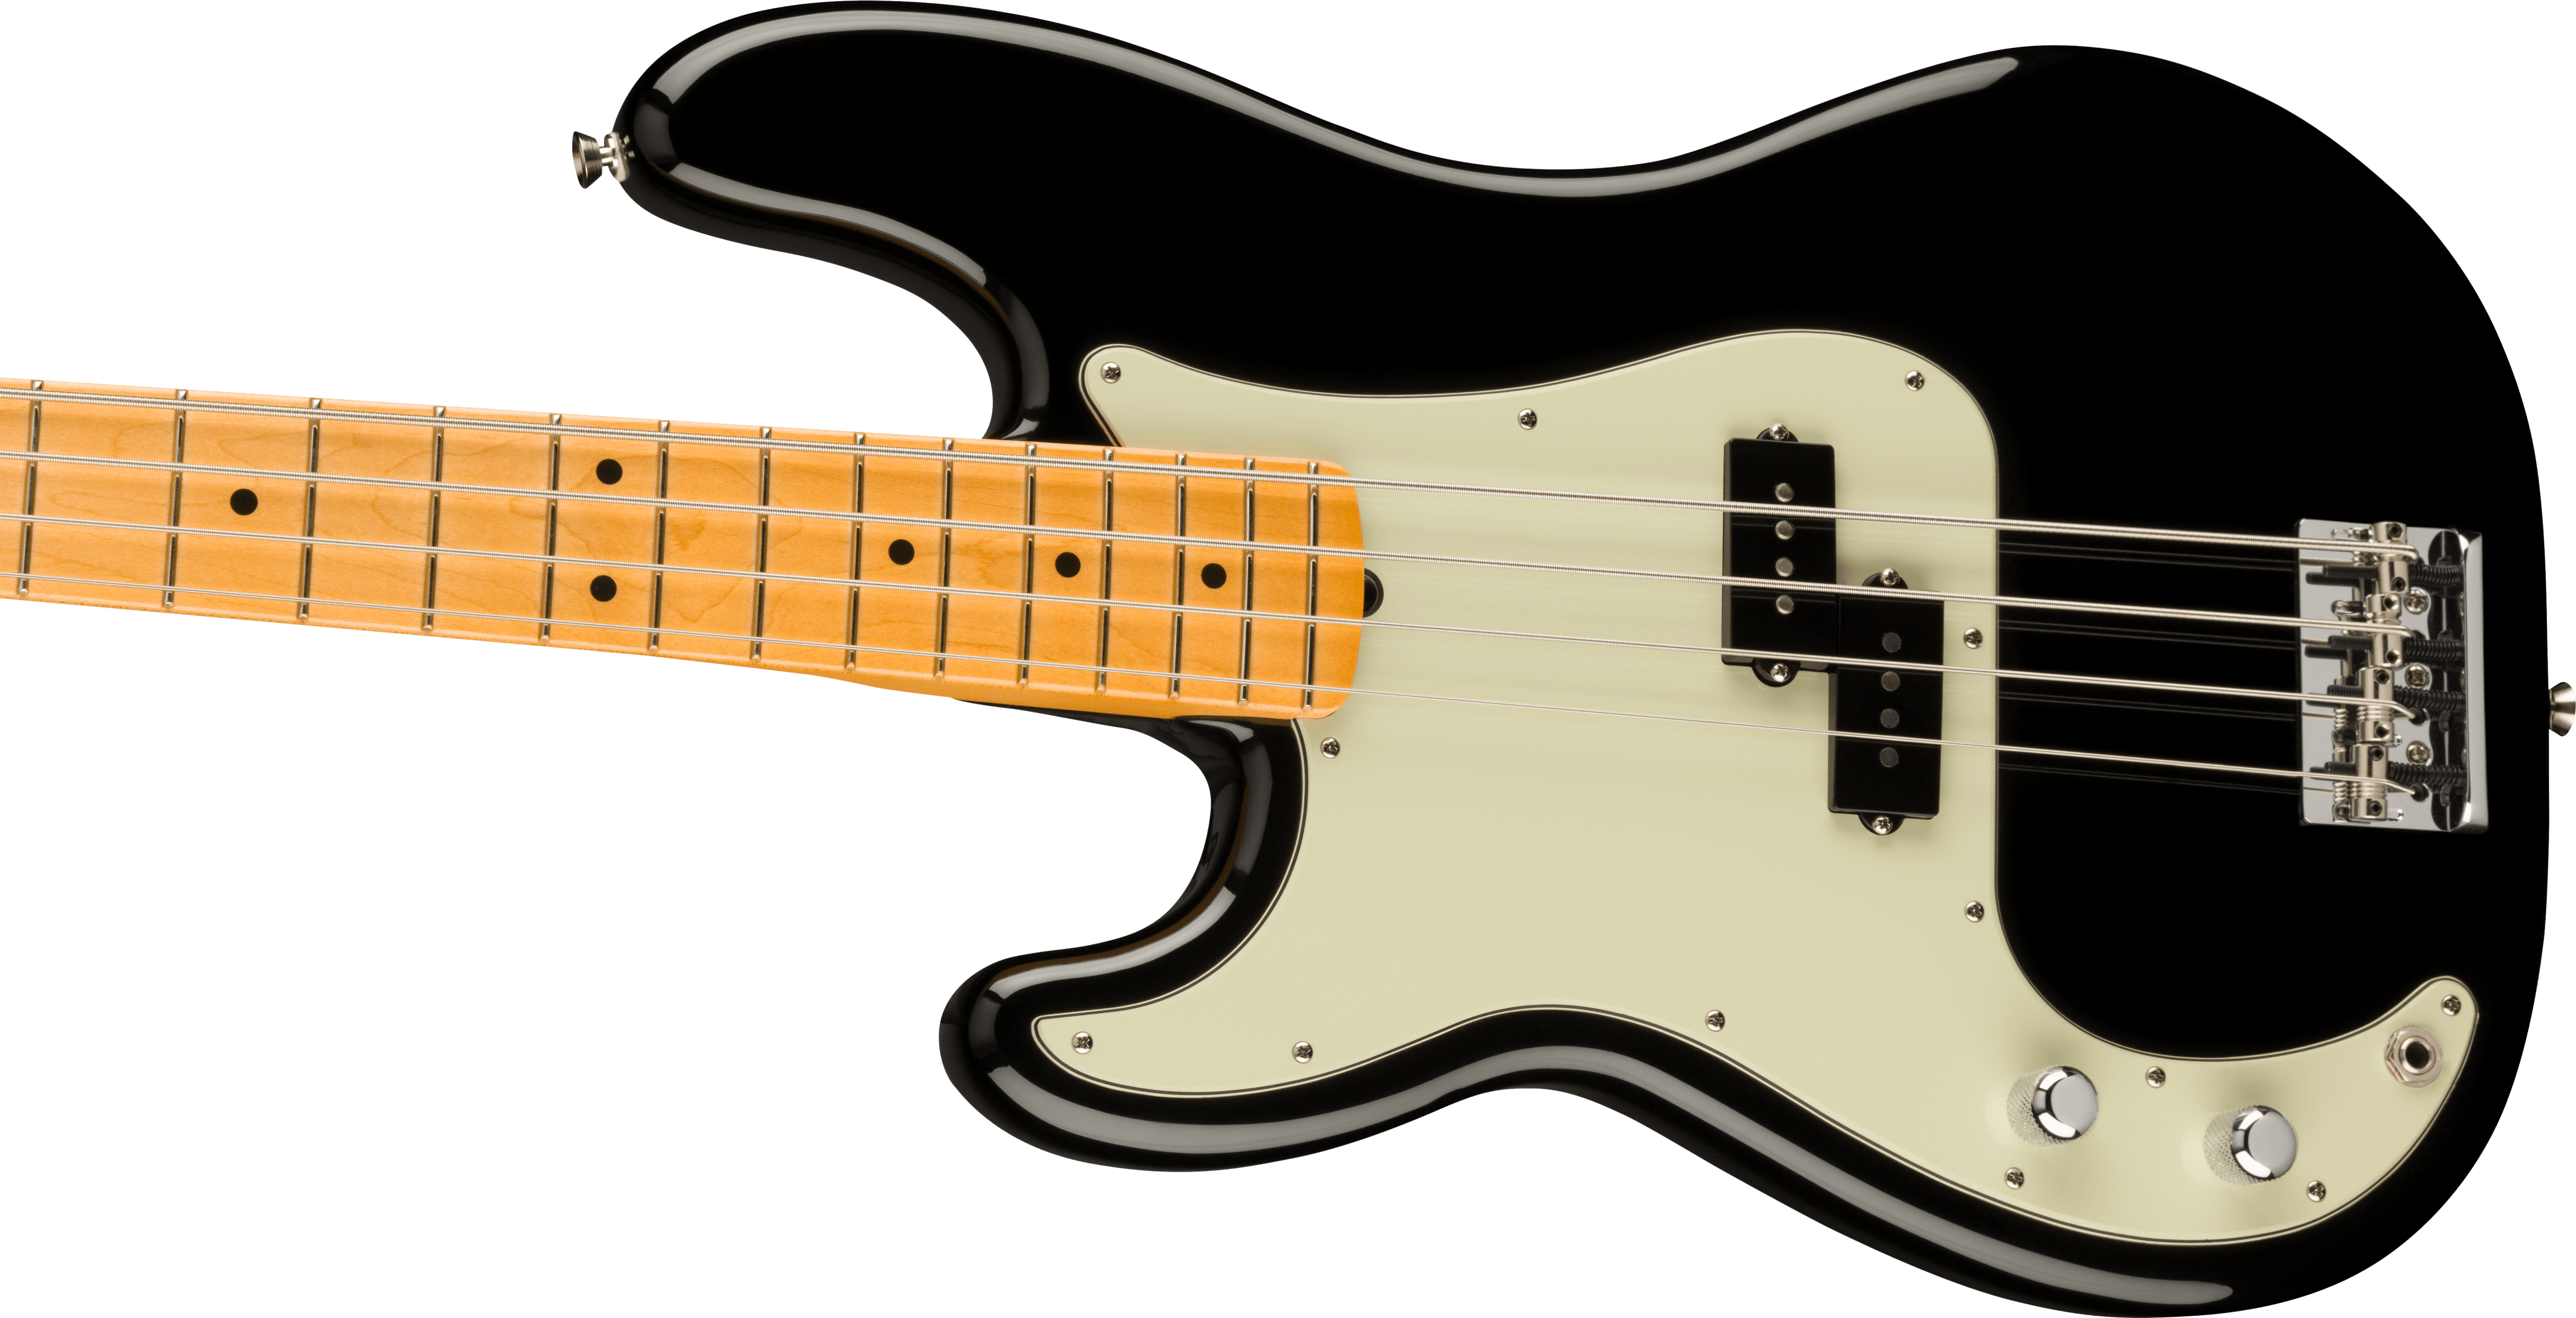 Fender American Professional II Precision Bass® Left-Hand, Maple Fingerboard, Black